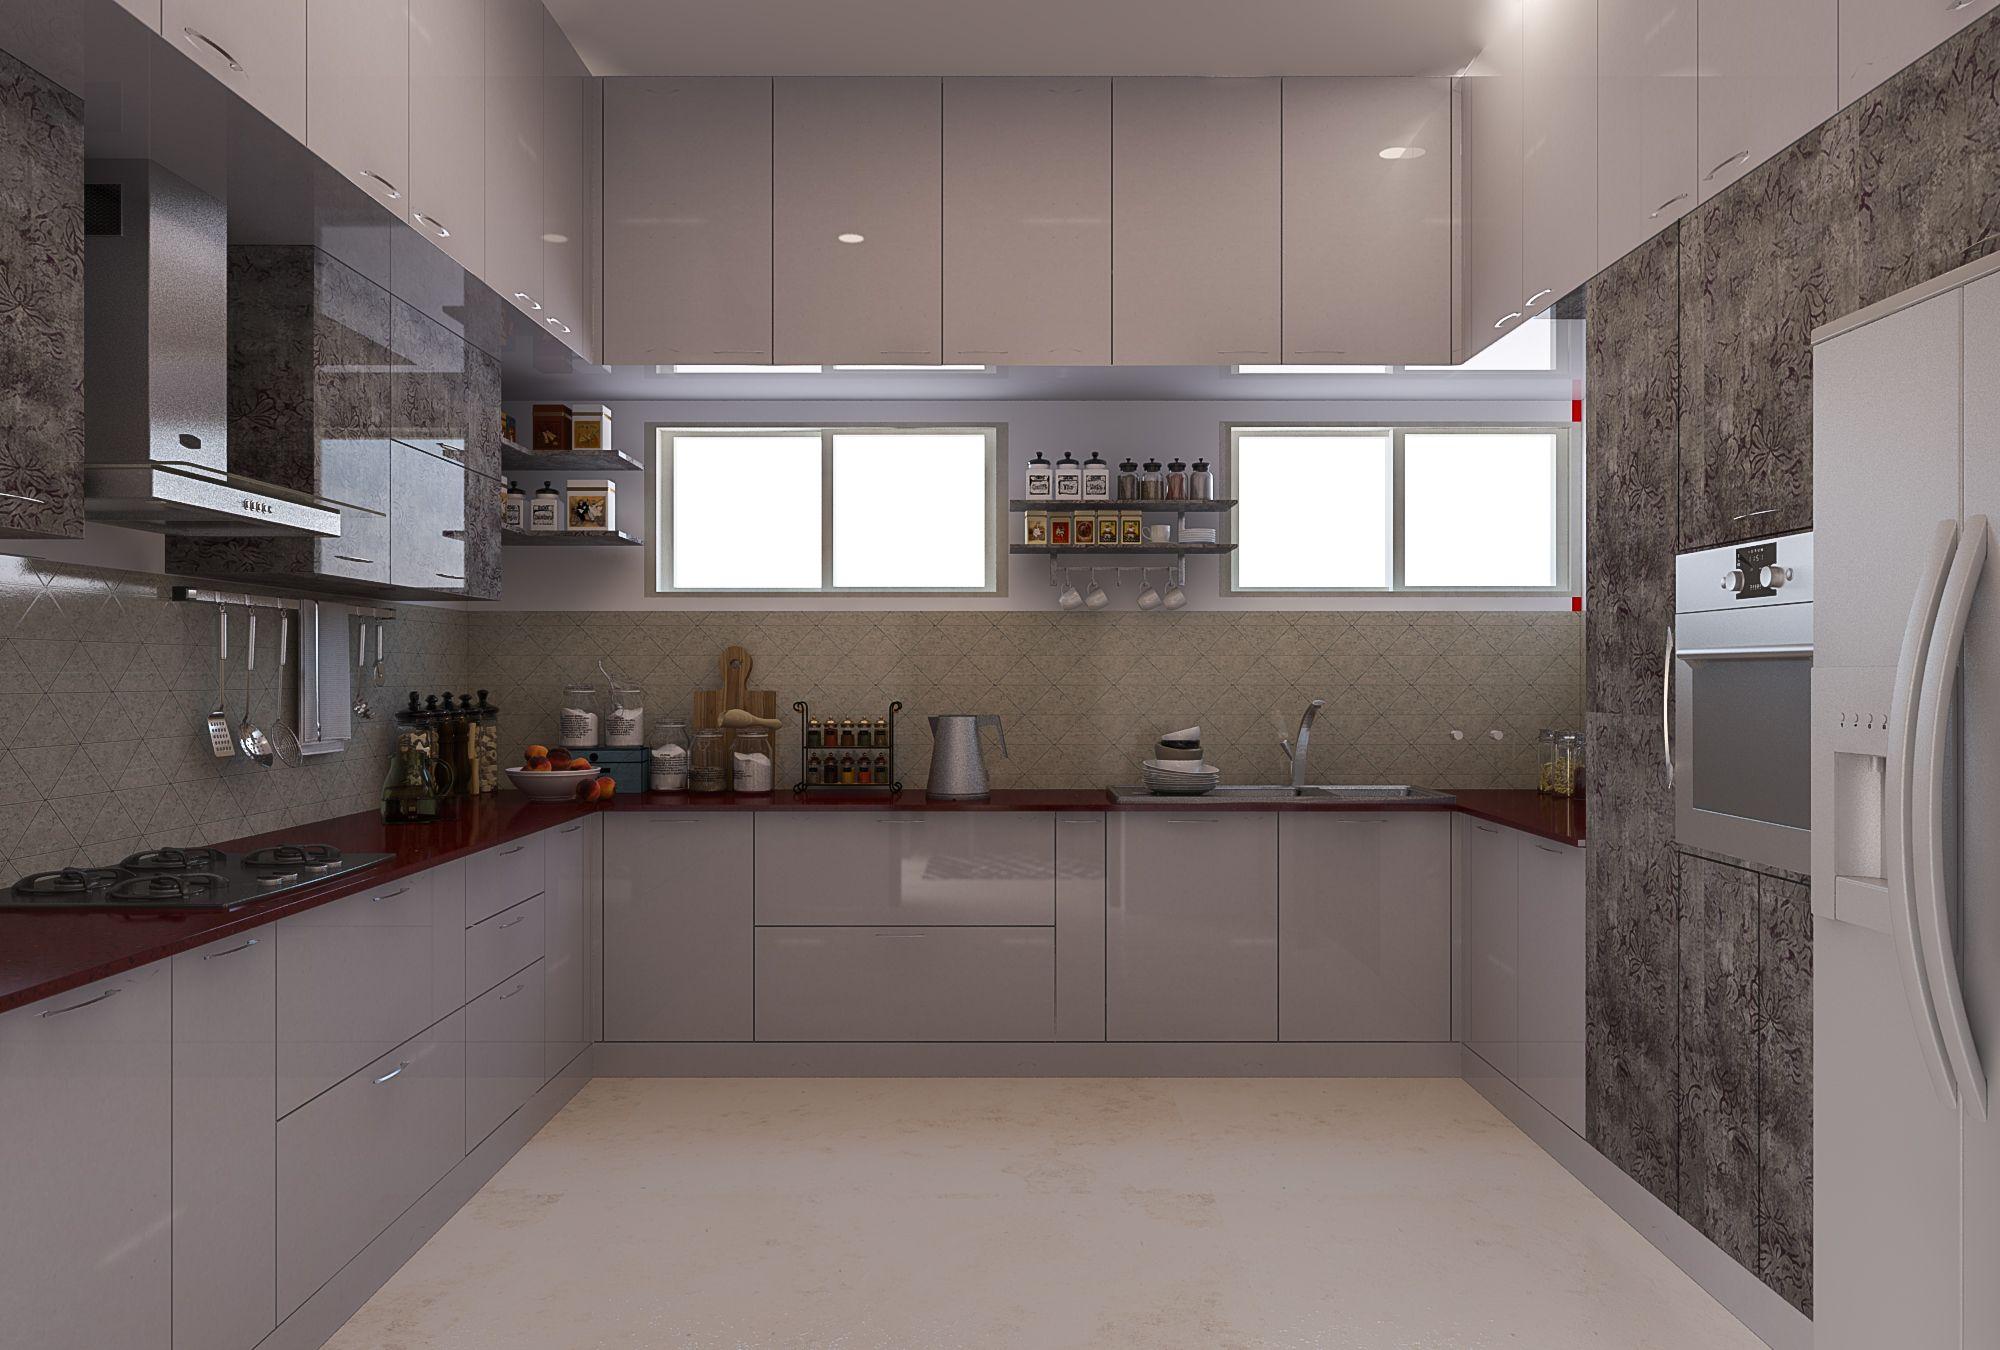 Modular Kitchen Bonito Designs Glossy Kitchen Kitchen Design Best Interior Design